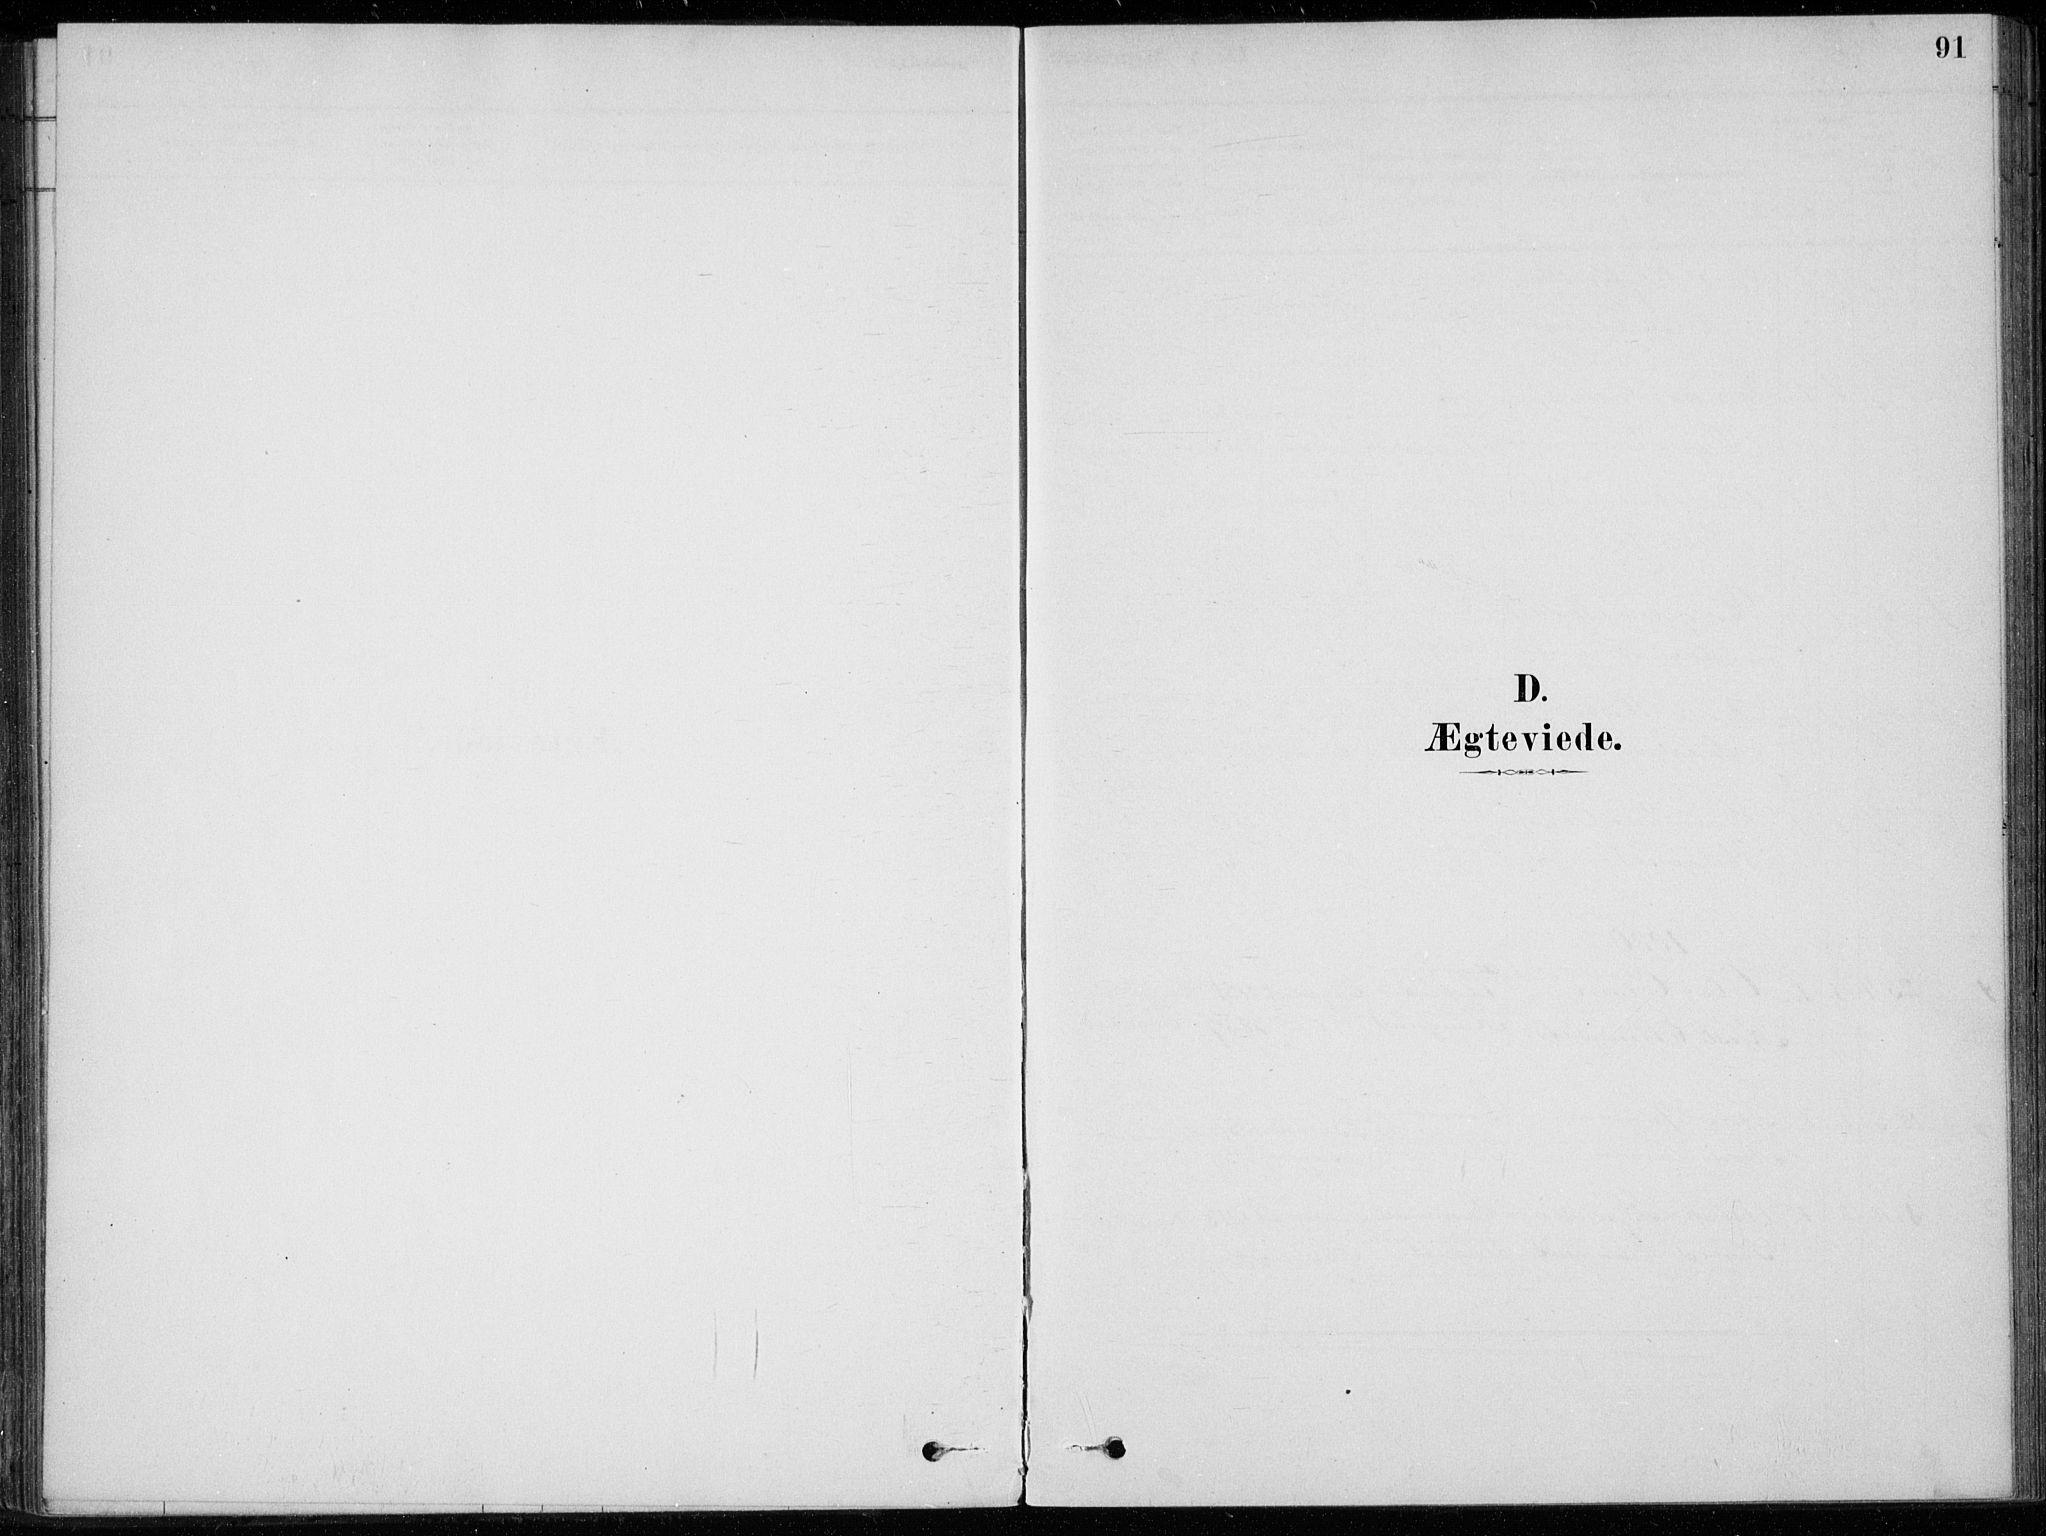 SAKO, Sigdal kirkebøker, F/Fc/L0001: Ministerialbok nr. III 1, 1879-1893, s. 91